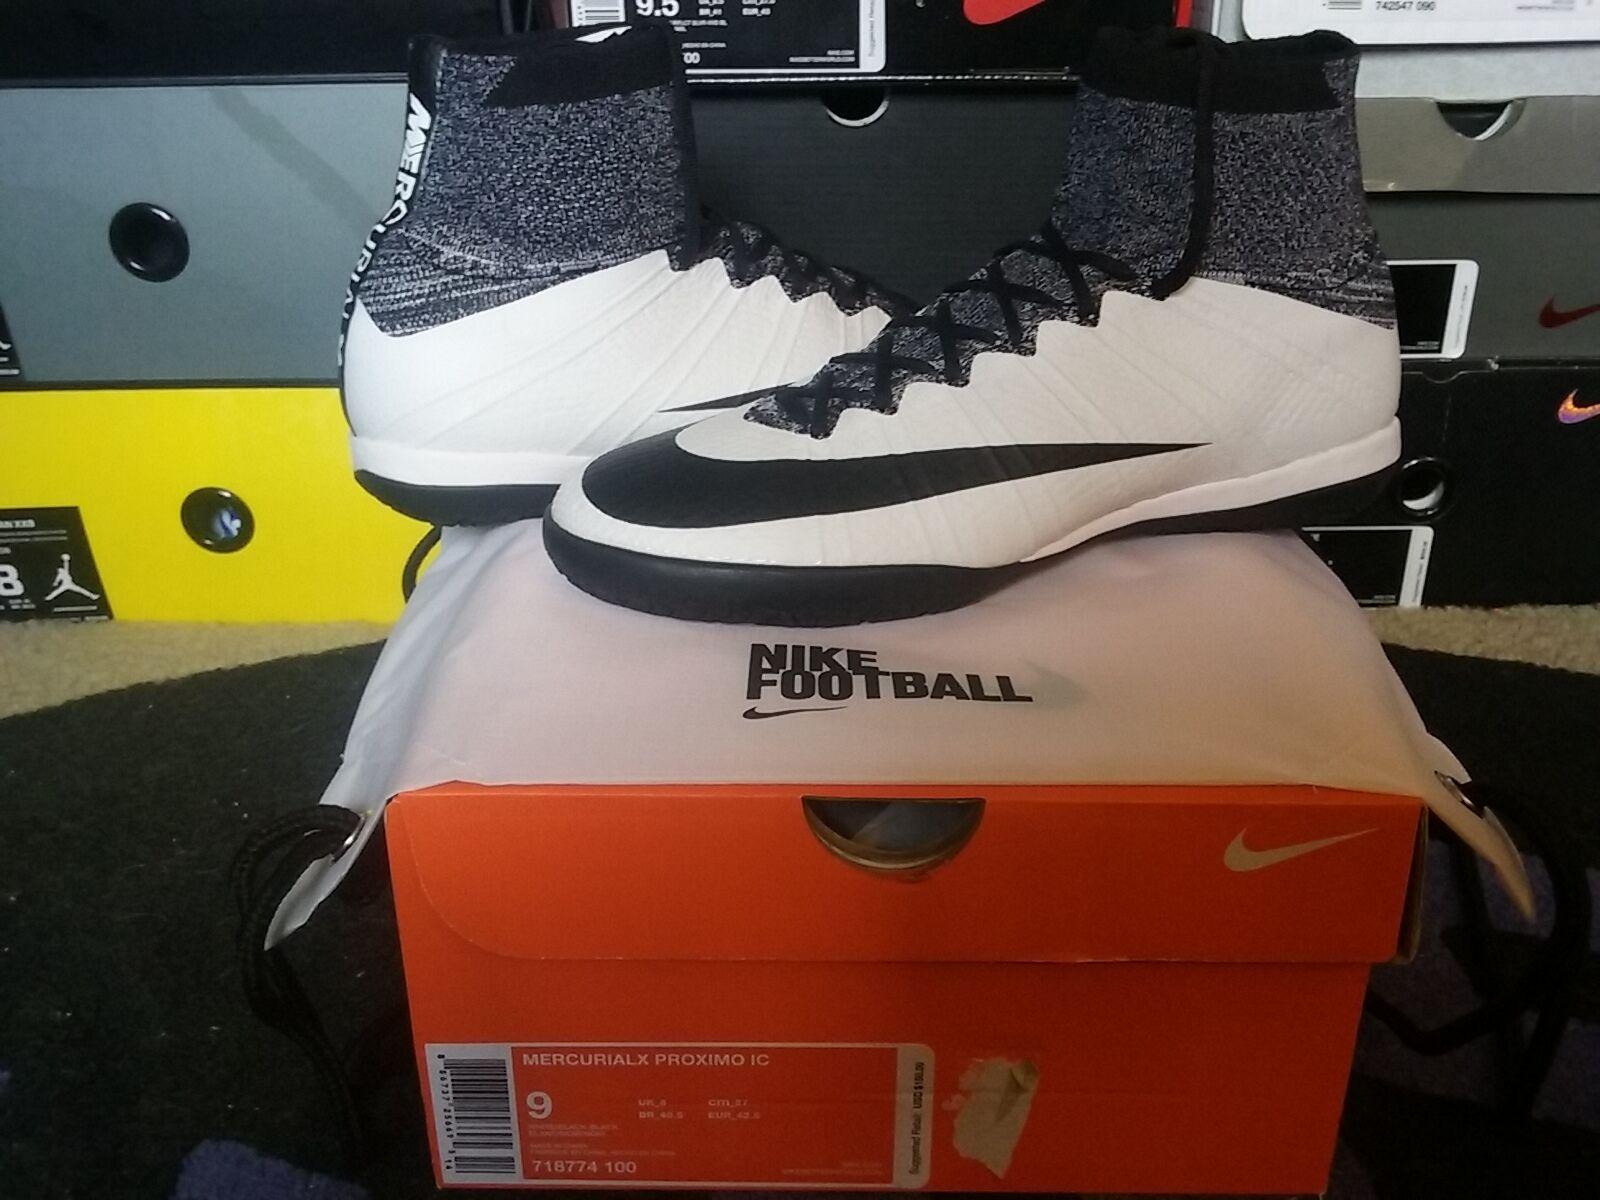 Nike Air MercurialX Proximo IC Neymar NJR White Black Indoor Soccer x 718774 100